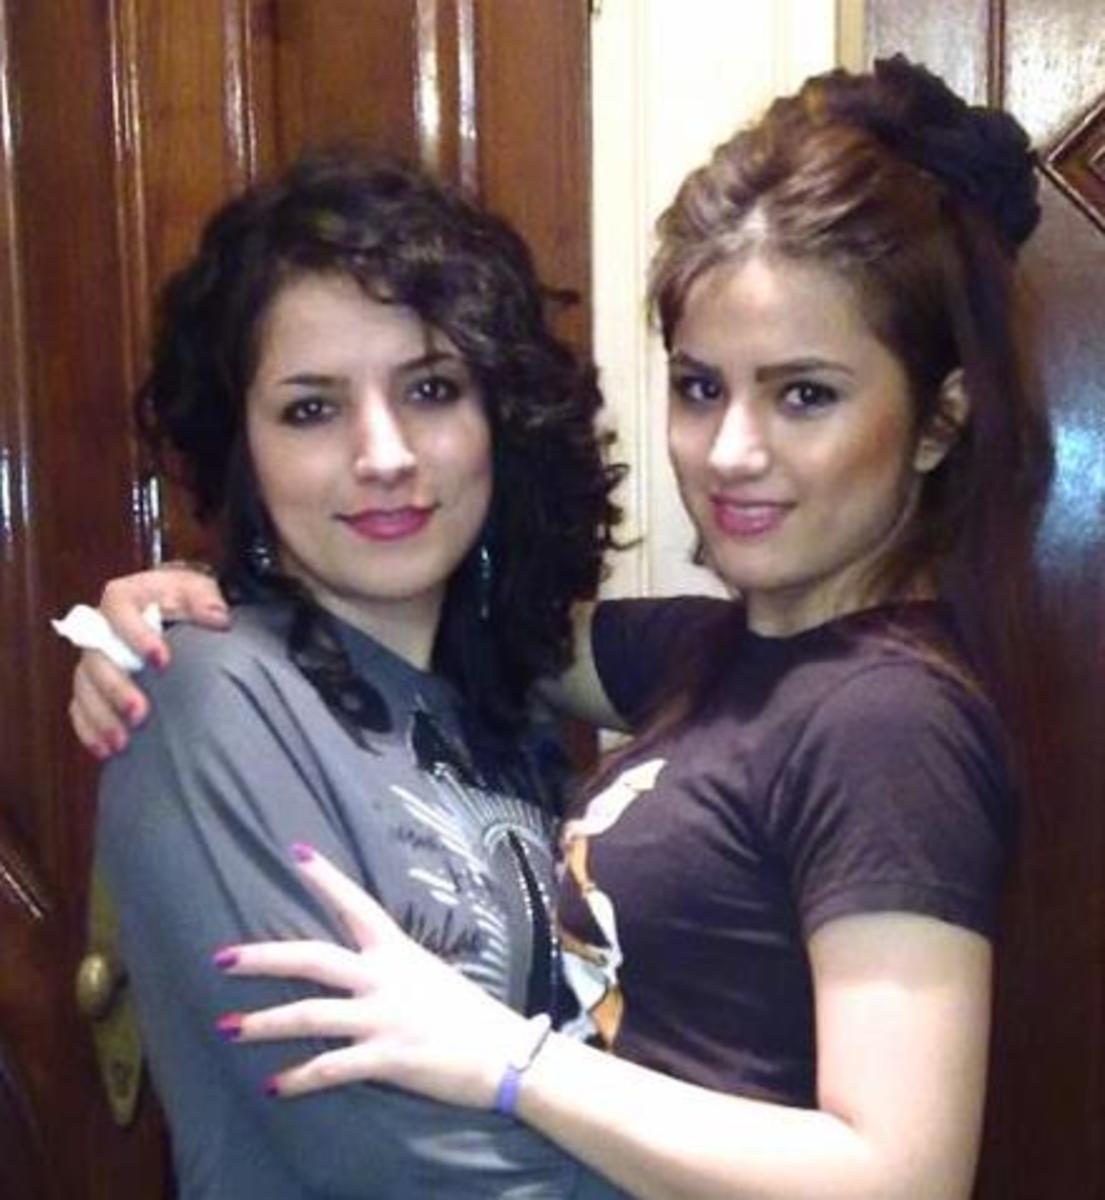 ©  Bahareh and her sister, Niloofar